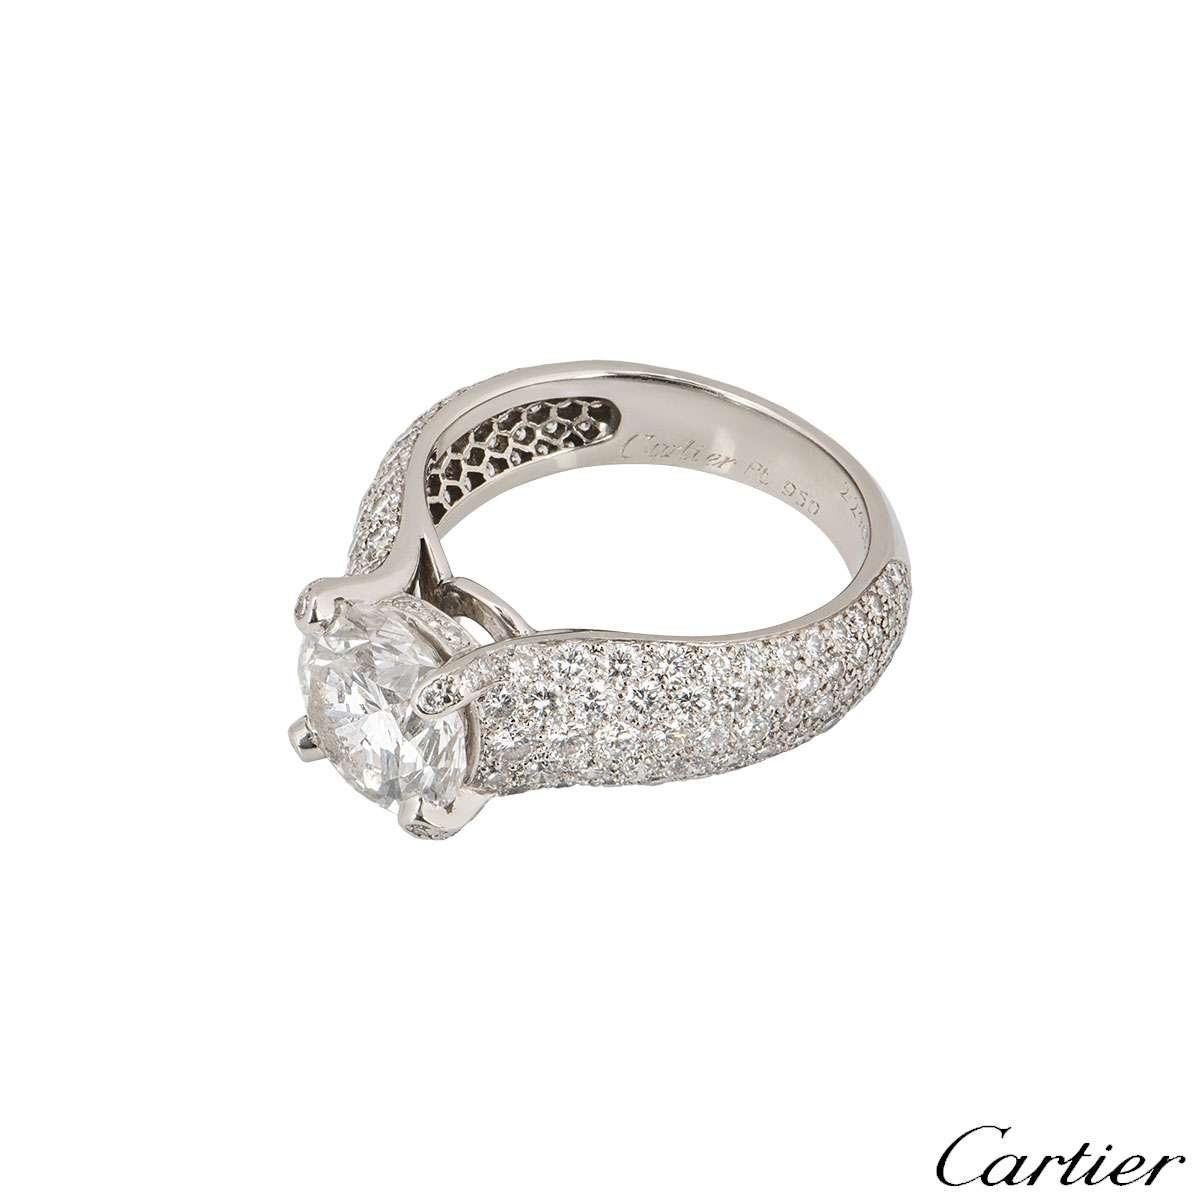 Cartier Platinum Diamond Luna Ring 2.24ct F/VVS1